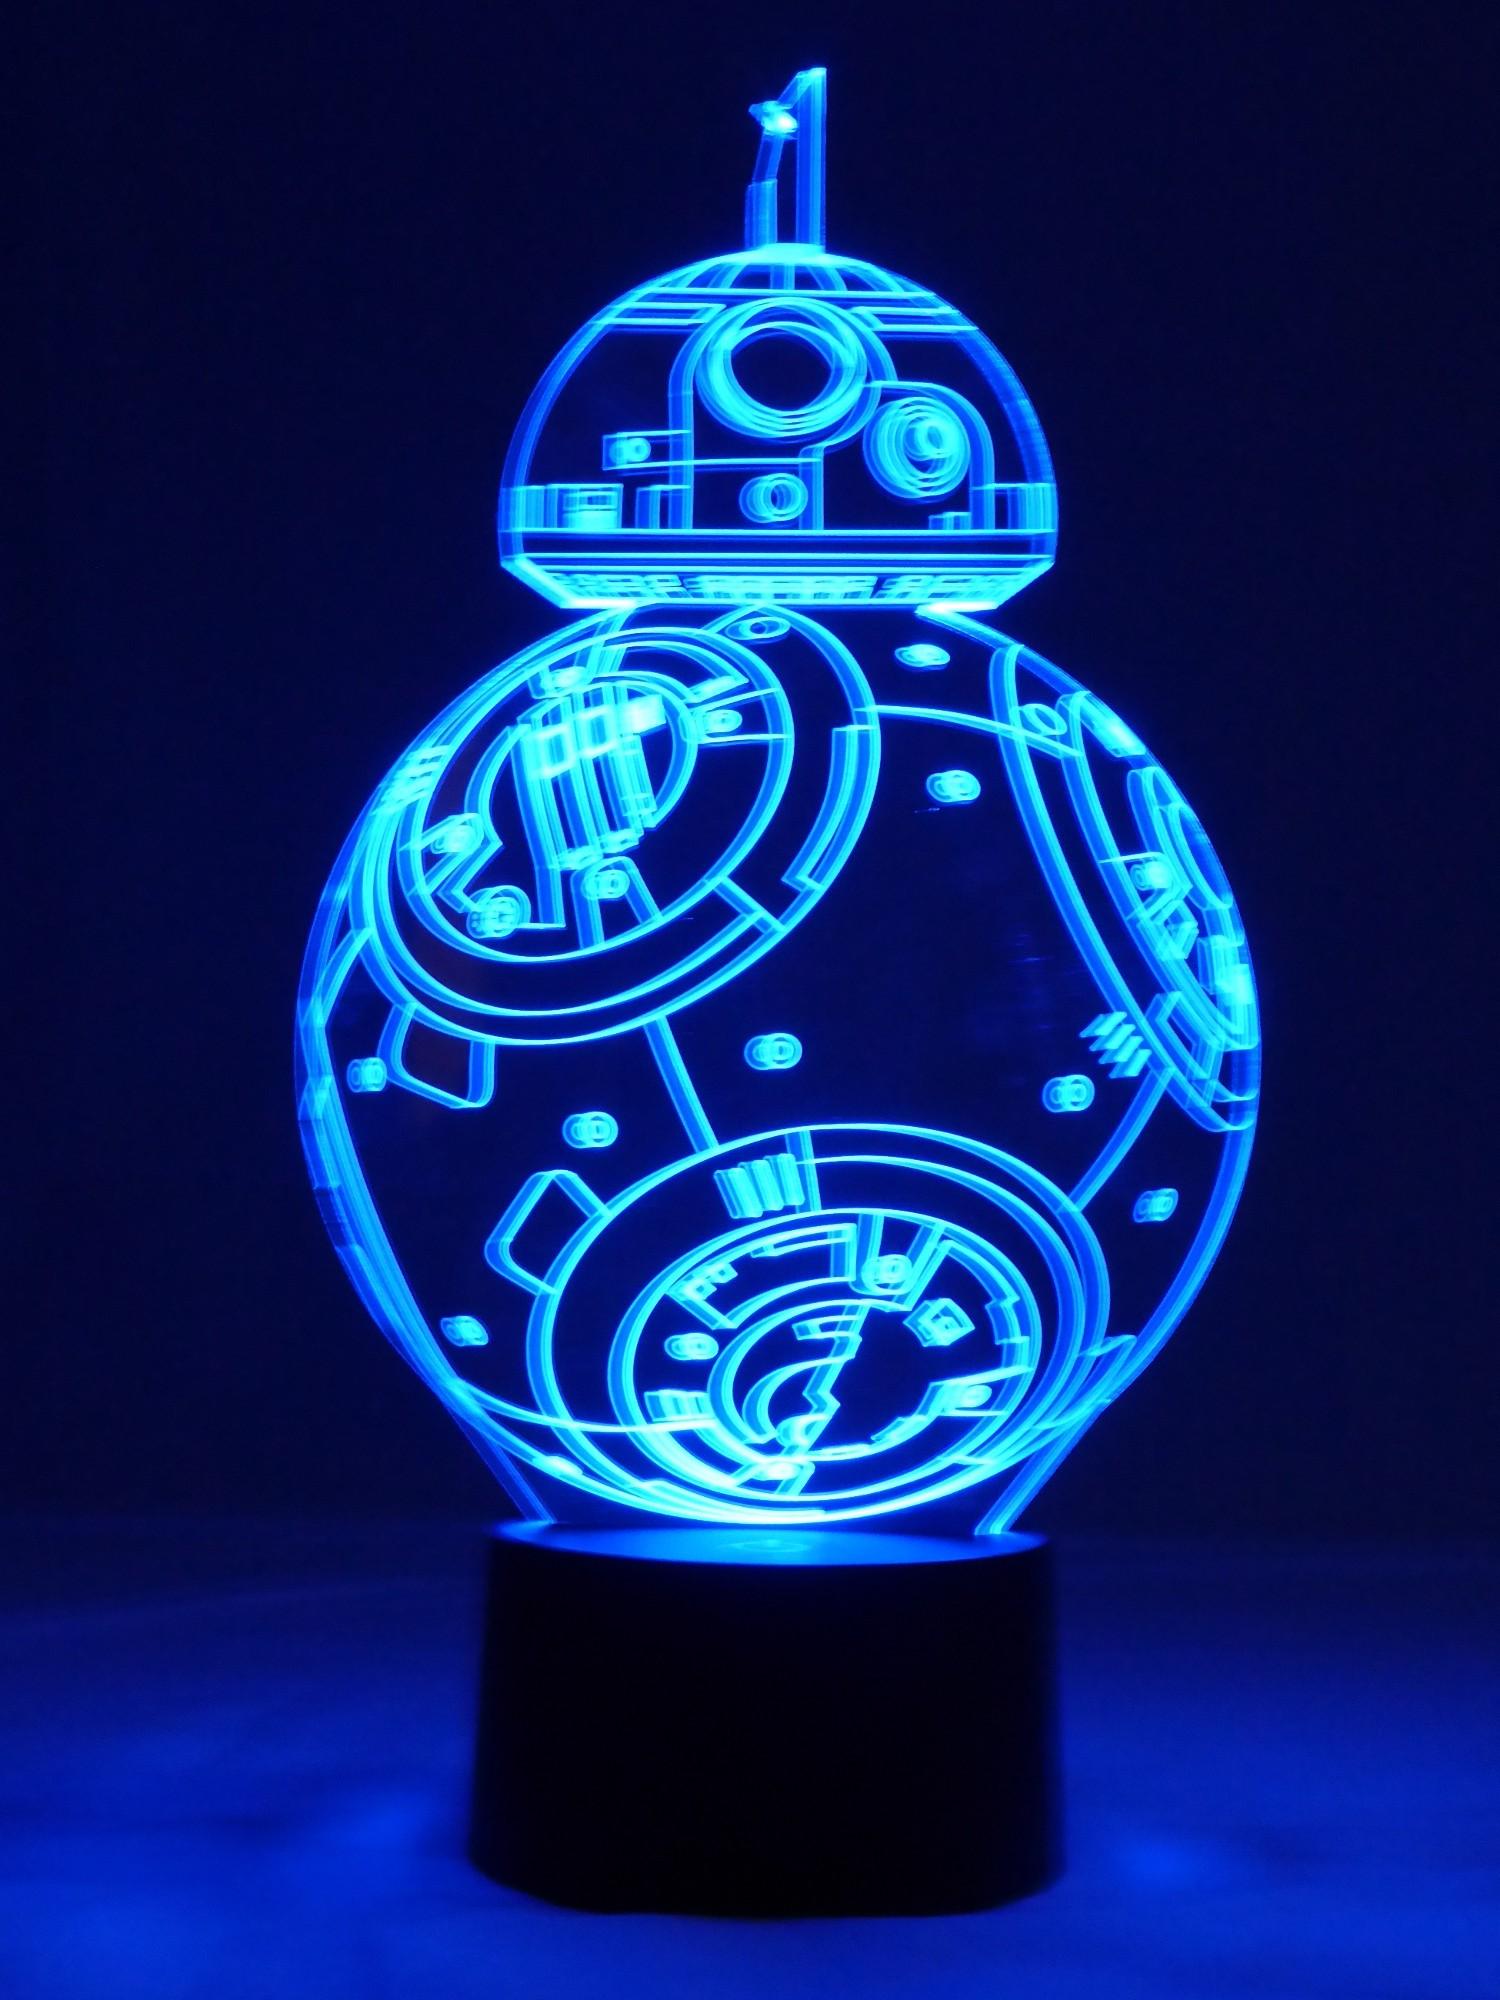 originelle 3d led lampe r2d2 droide tischlampe wohnlicht mit farbwechsel show effekt. Black Bedroom Furniture Sets. Home Design Ideas